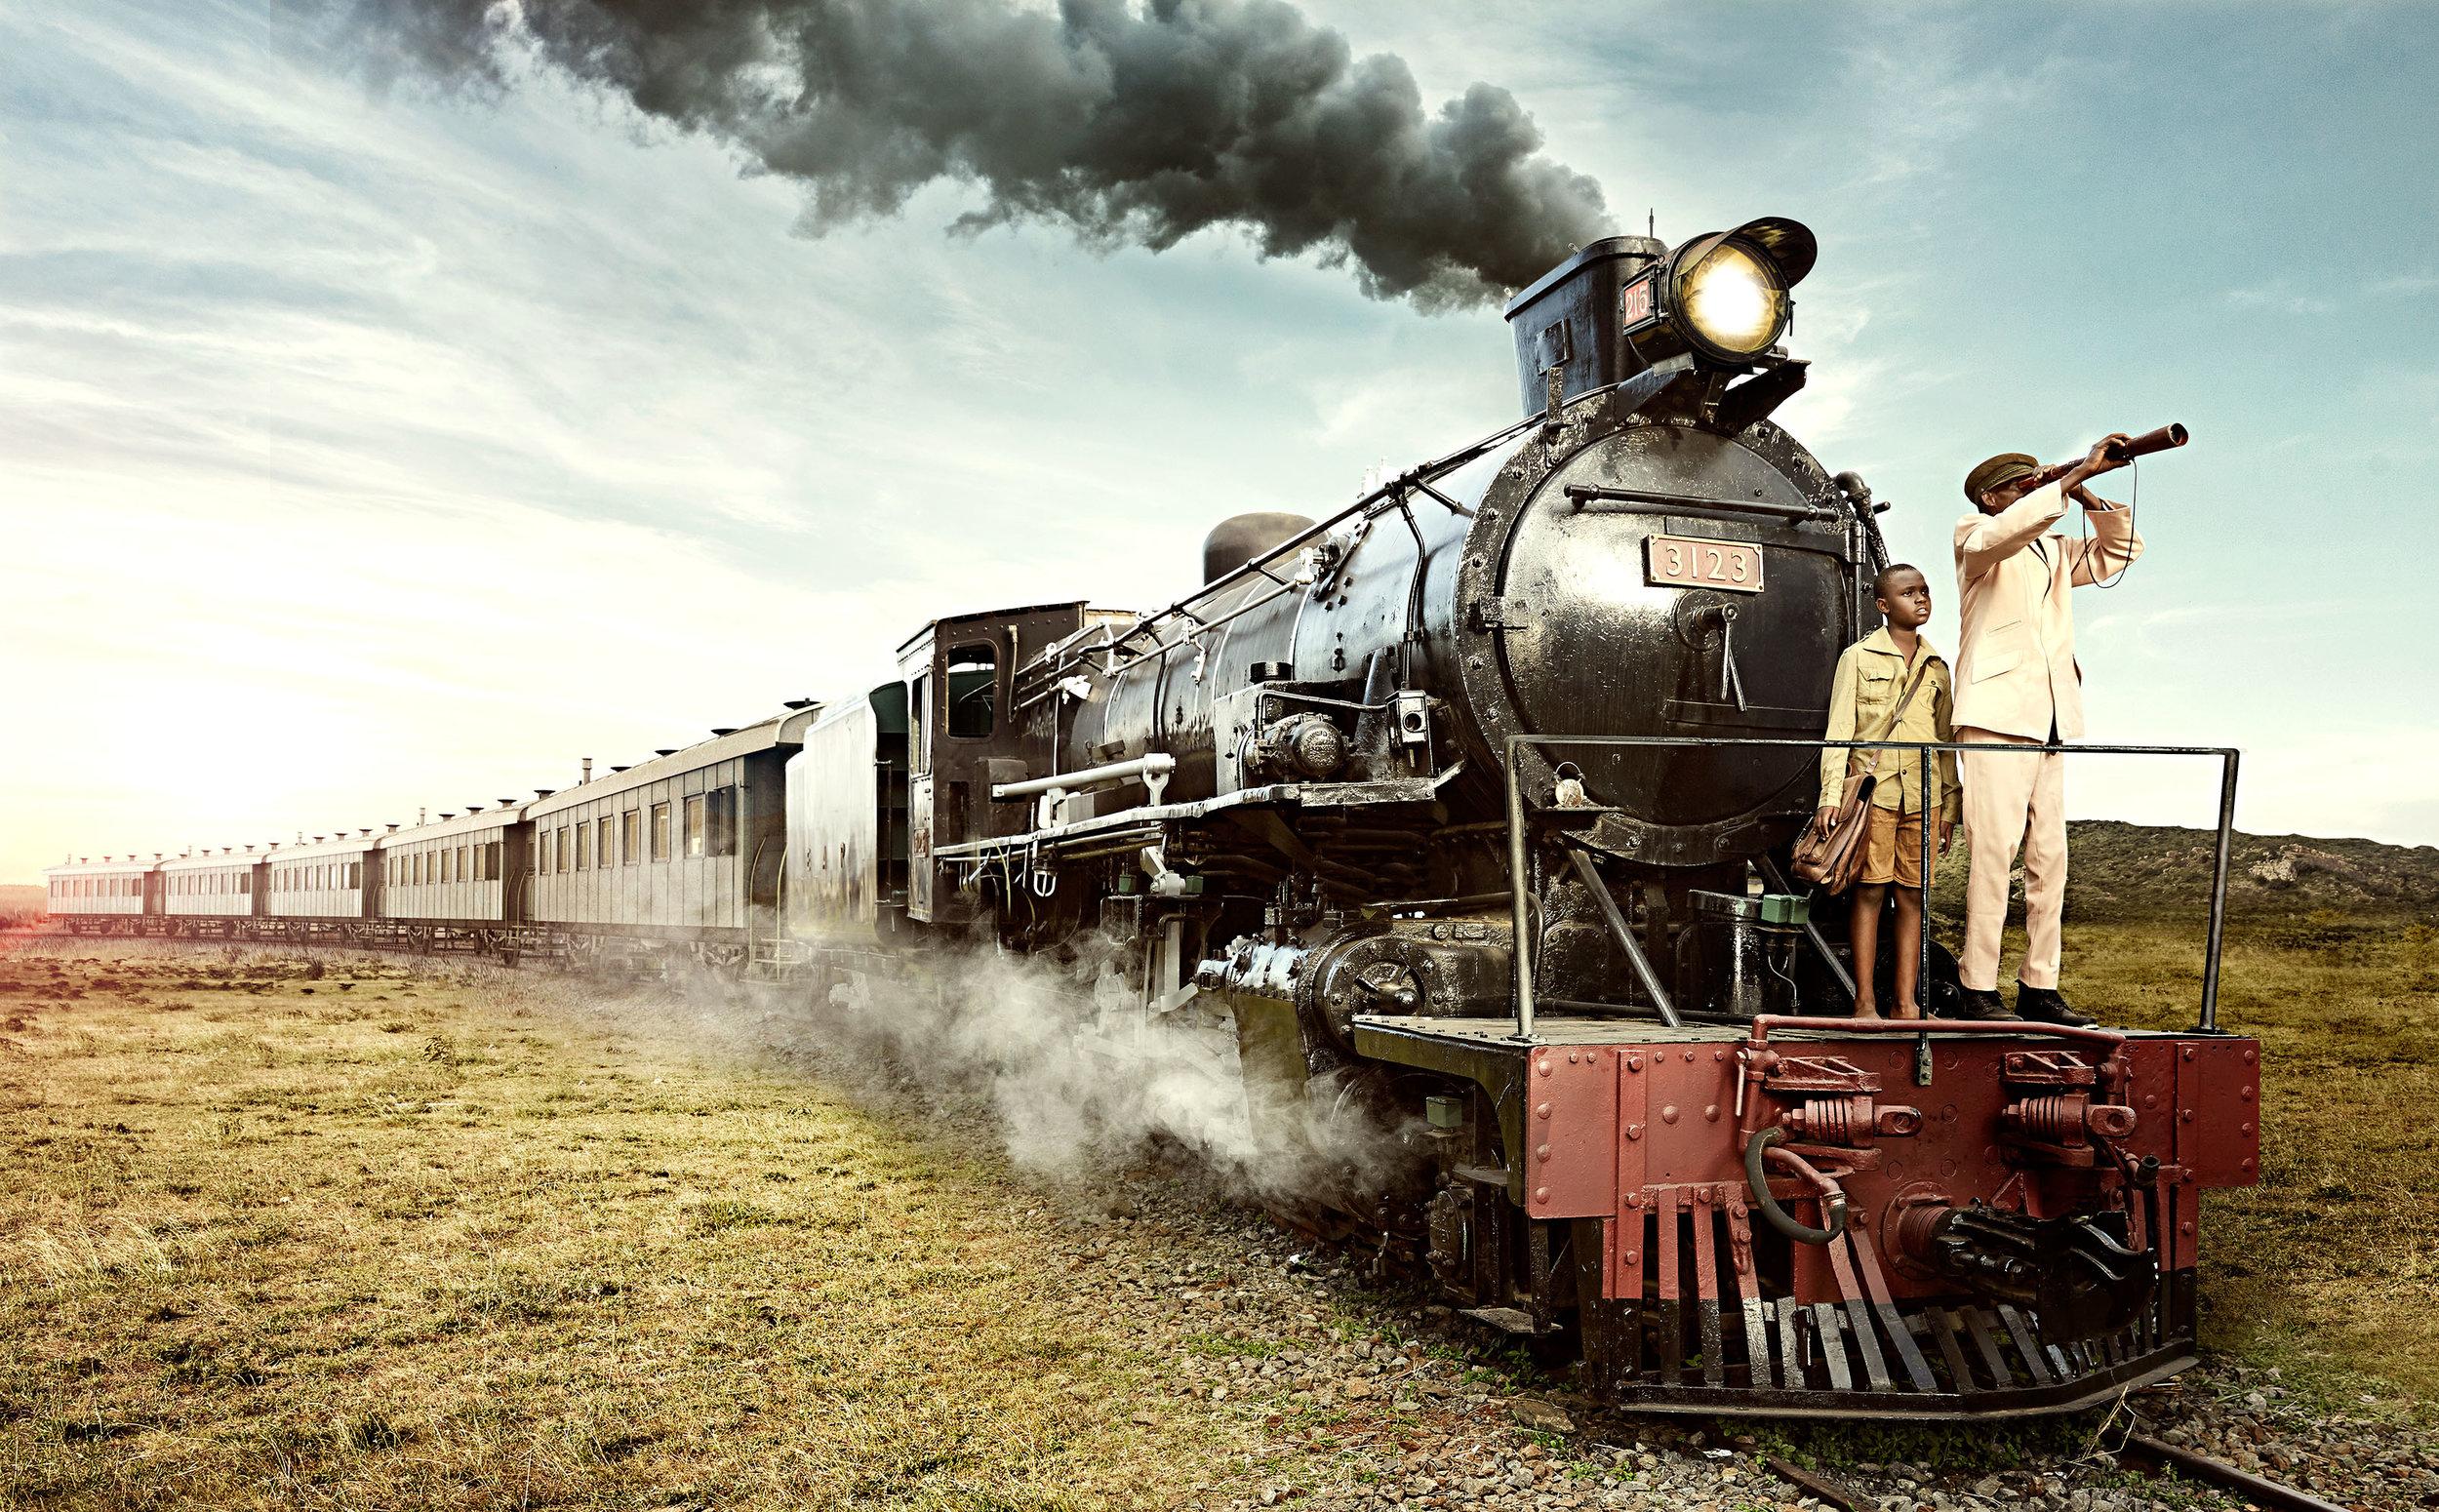 Train_Tsavo Train